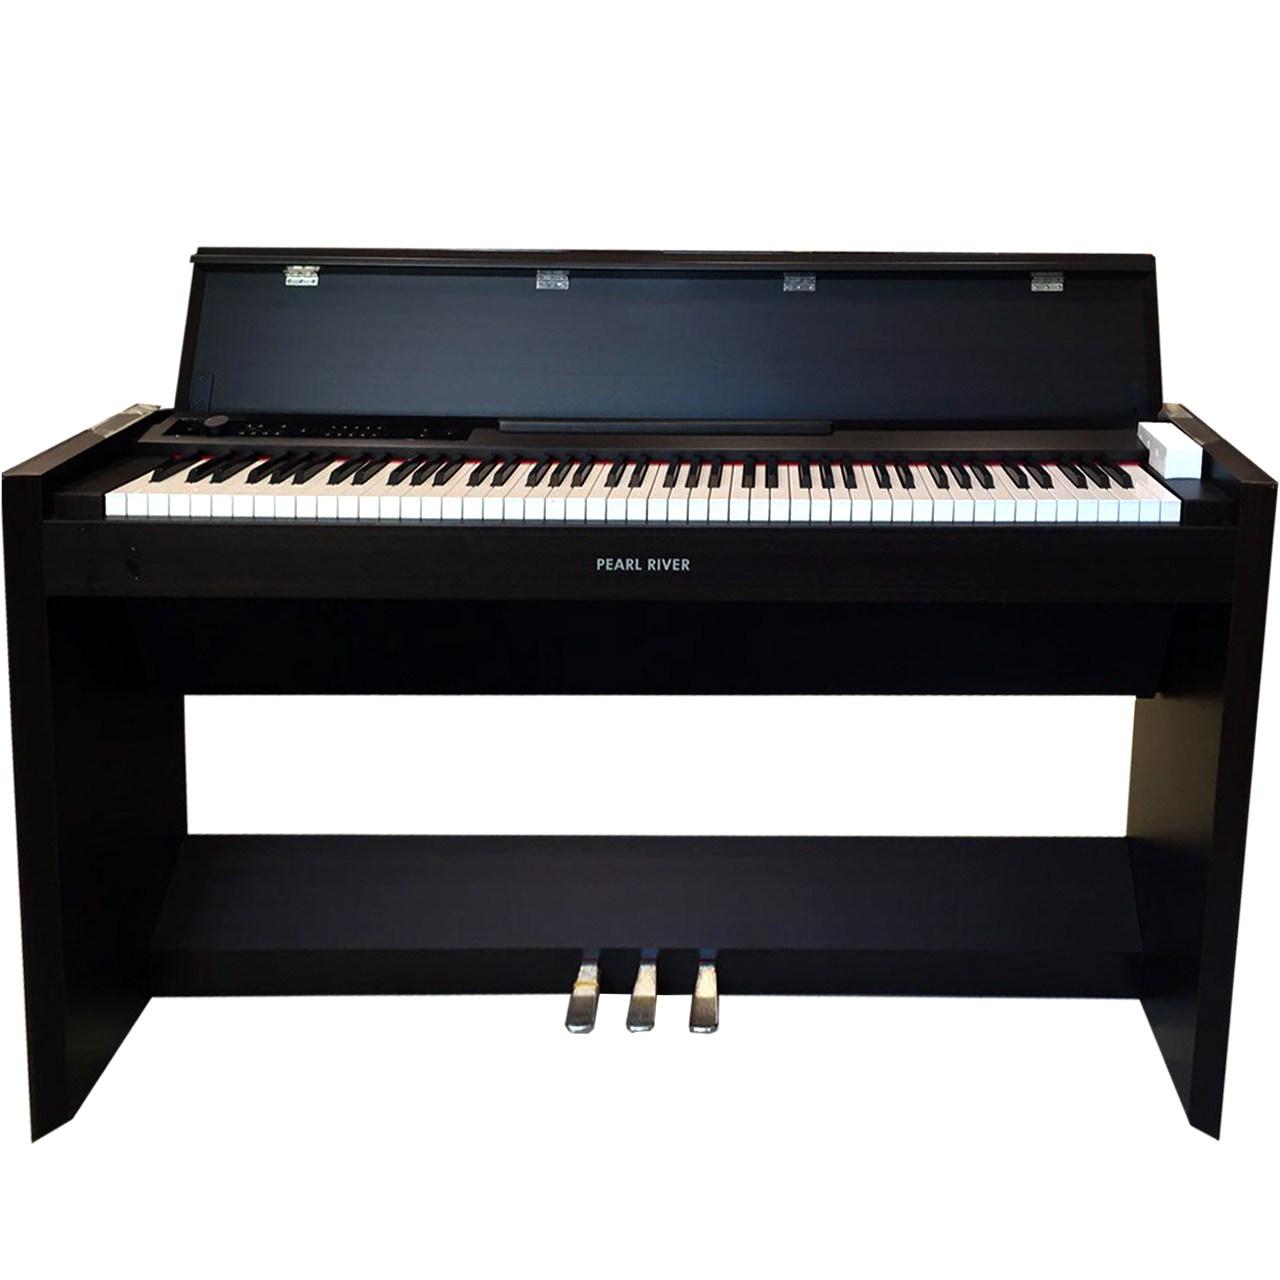 پیانو دیجیتال پرل ریور مدل PRK 300